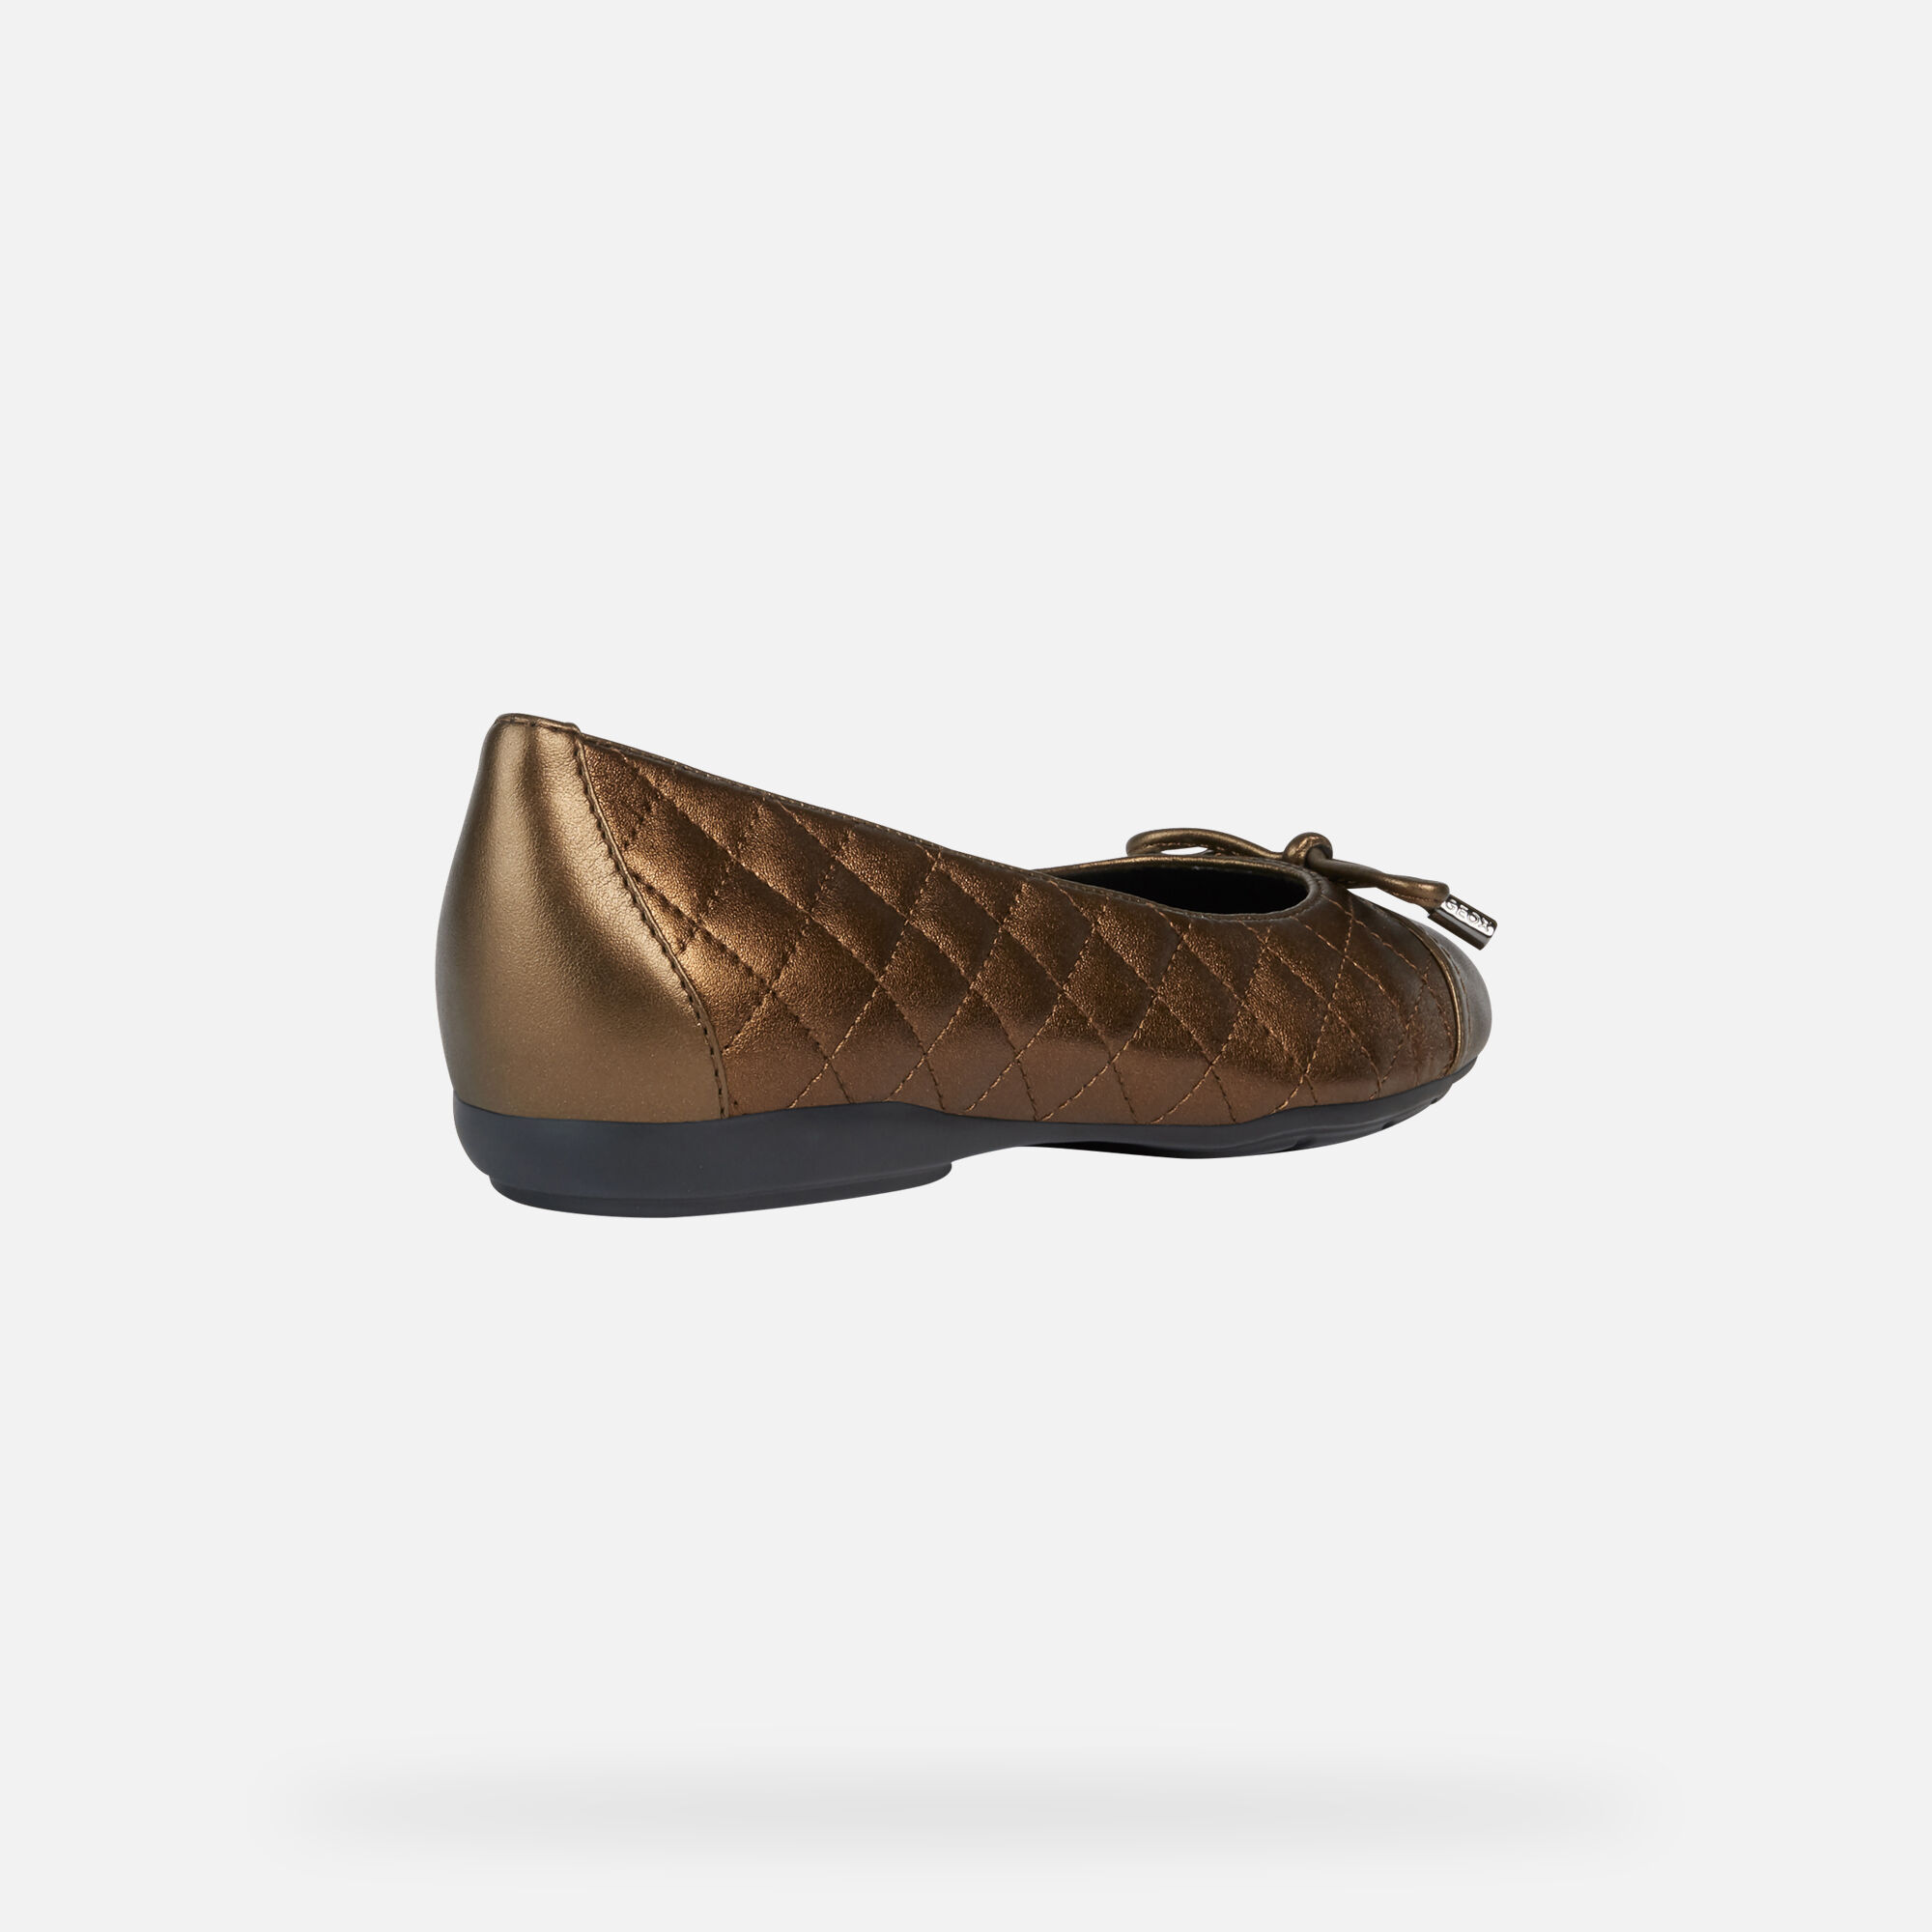 Geox ANNYTAH Frau: bronze Ballerinas | Geox ® FW 1920